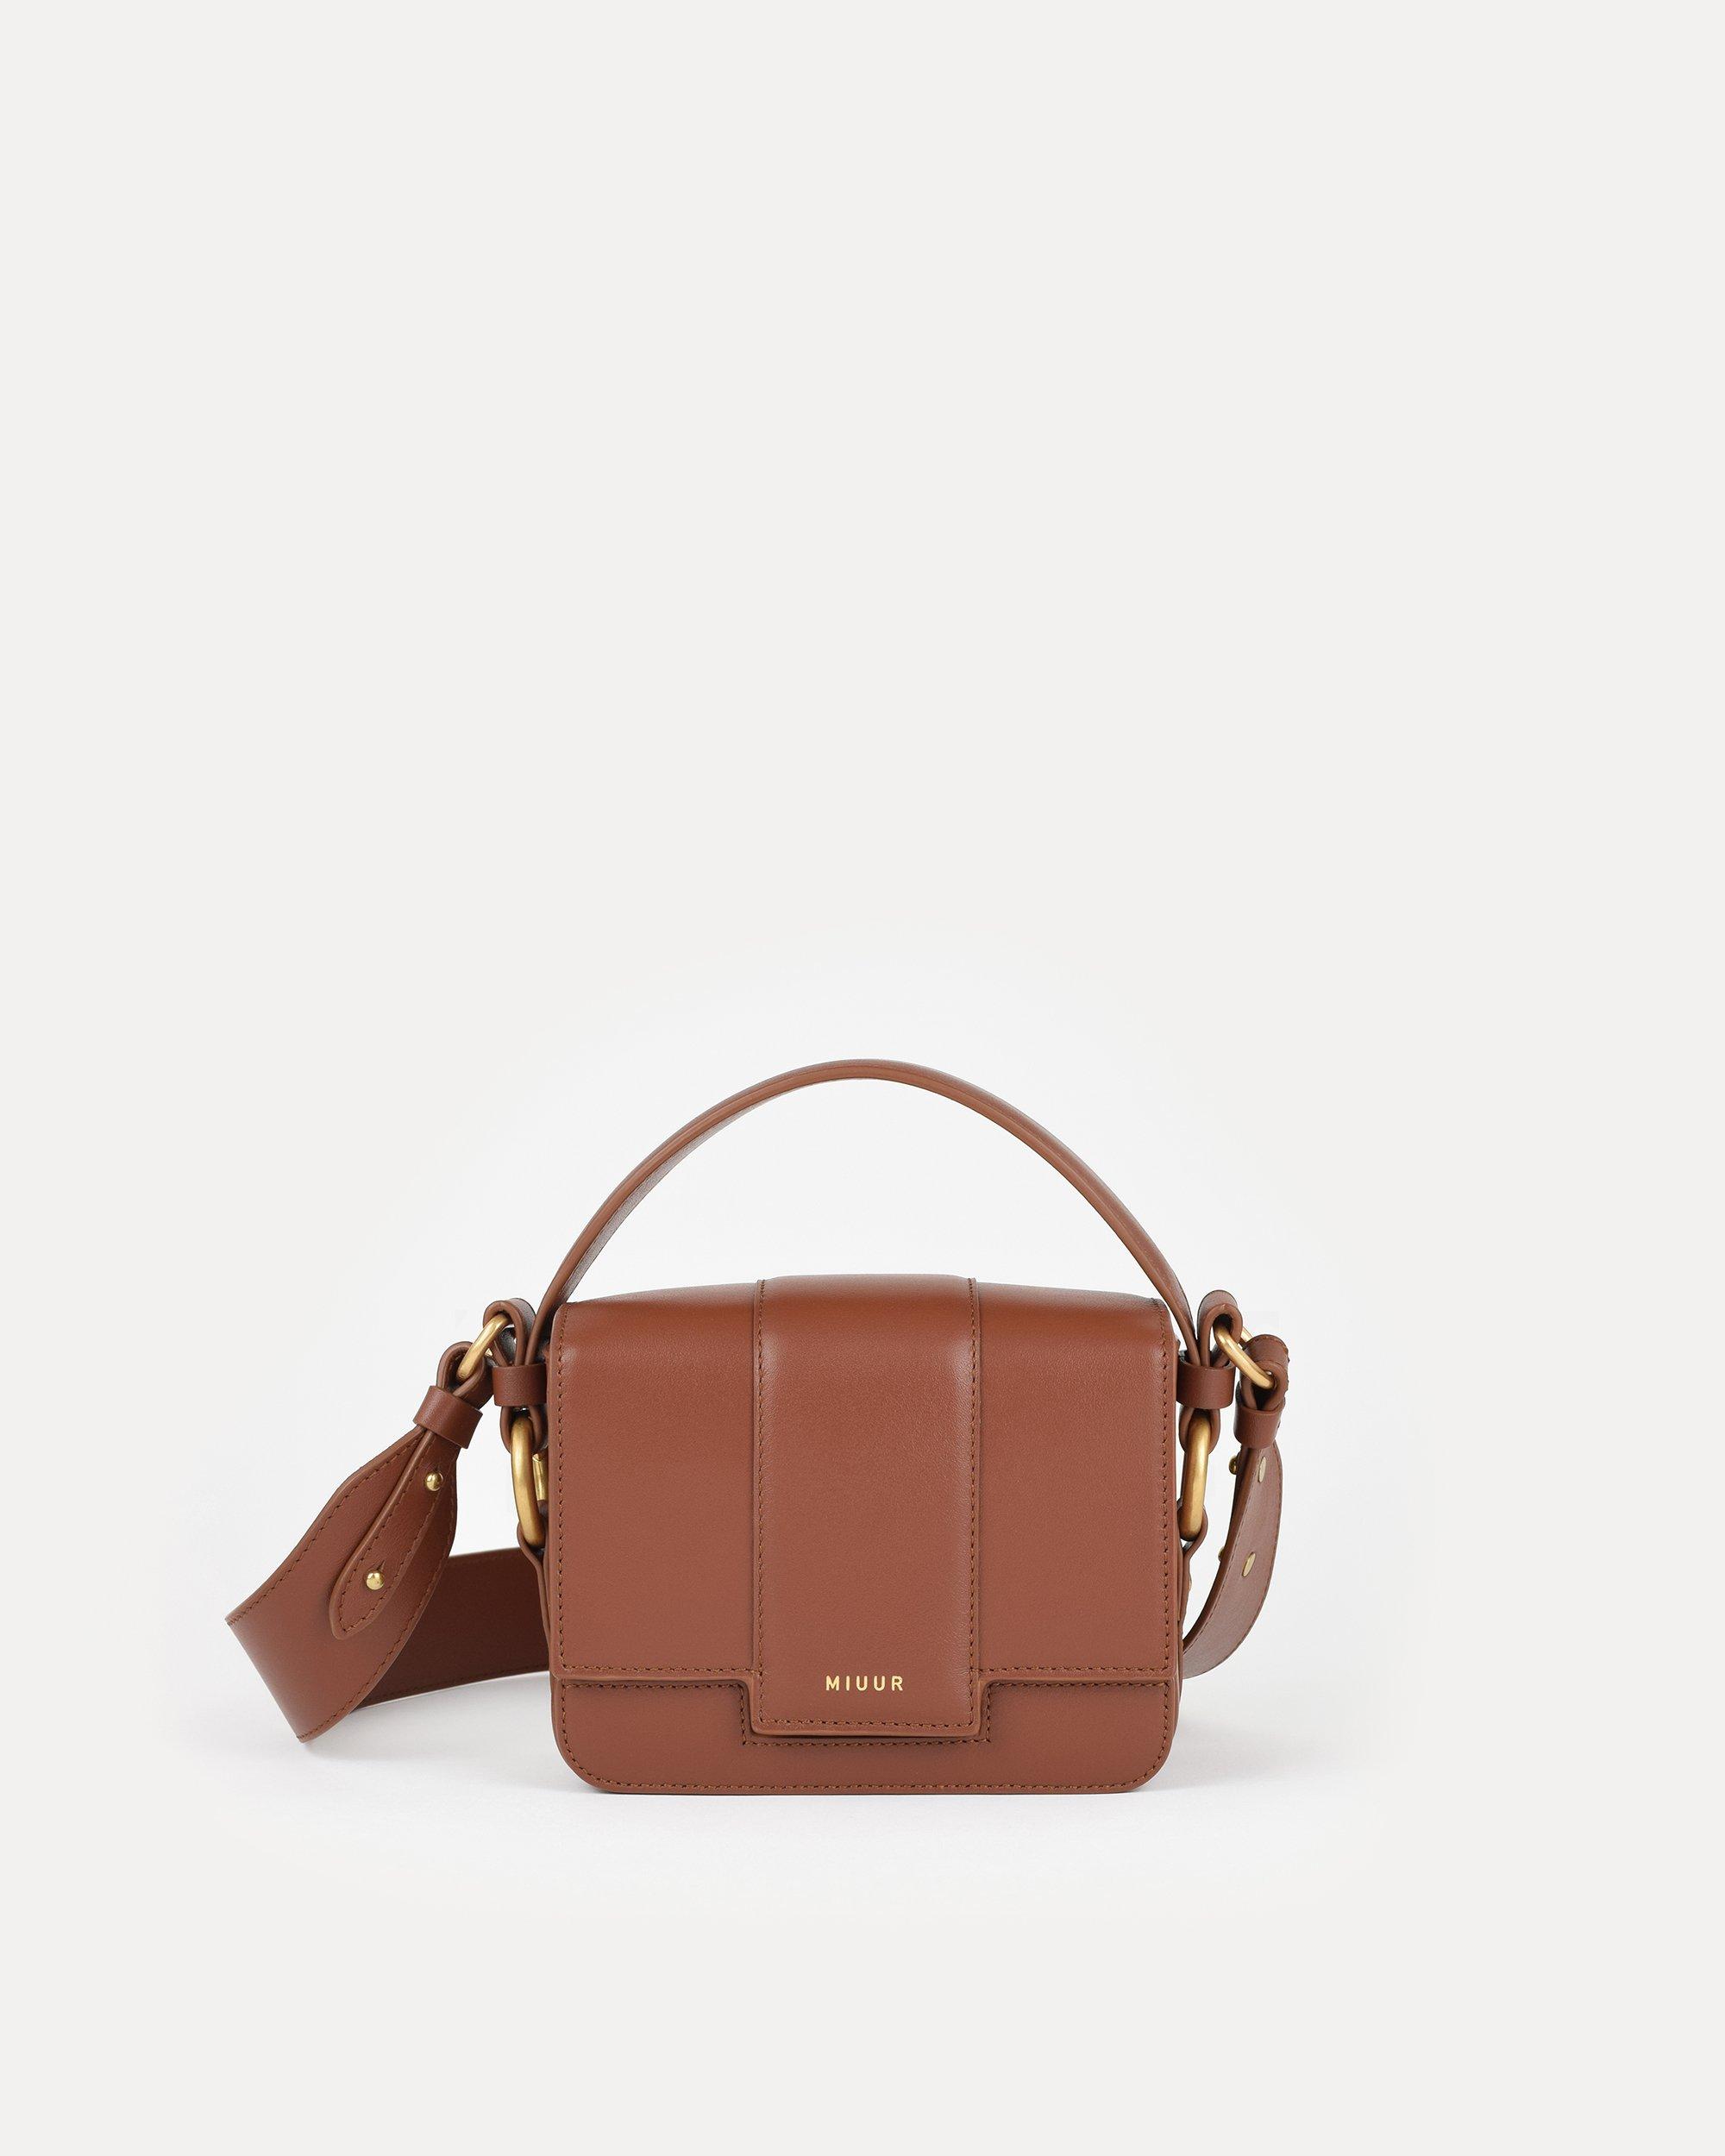 miuur m handbag havana brown